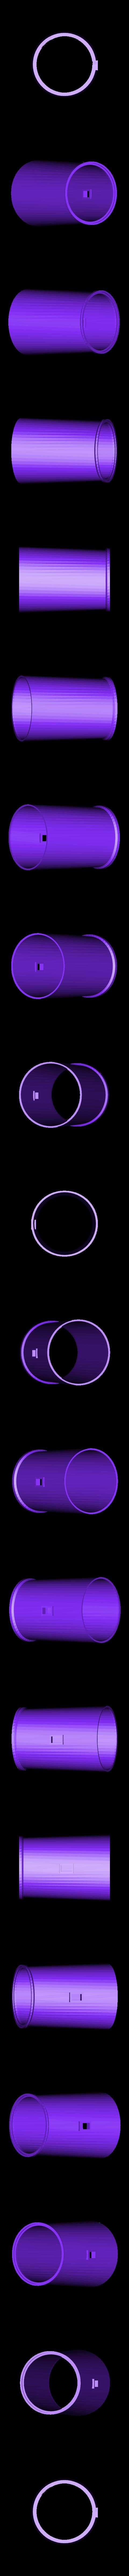 LH_round_body1.stl Download free STL file Round Base Lighthouse Model • Model to 3D print, Ogubal3D